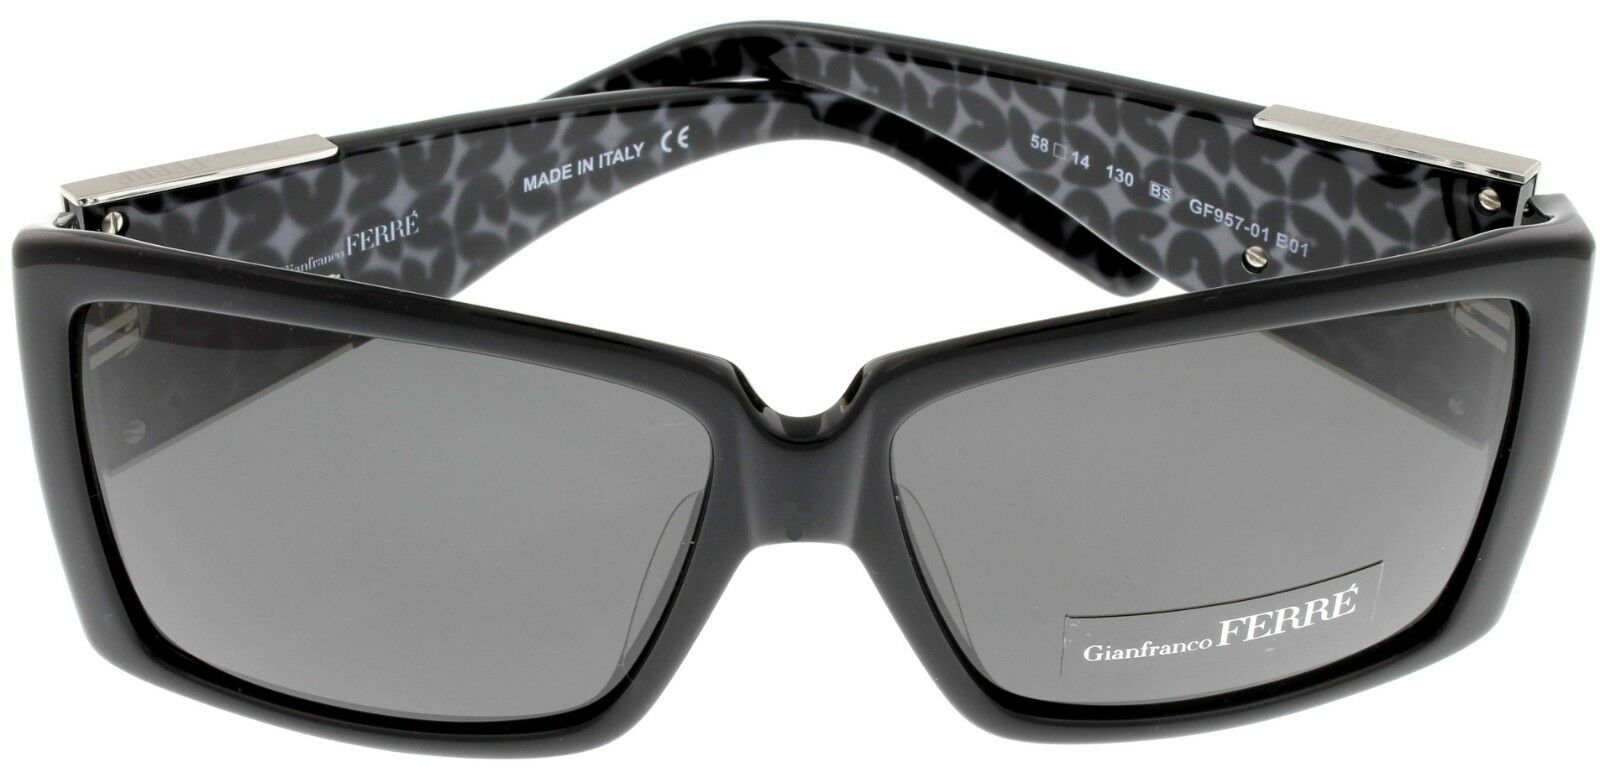 72361064def1 Buy Gianfranco Ferre Sunglasses Women Black Palladium Rectangular ...